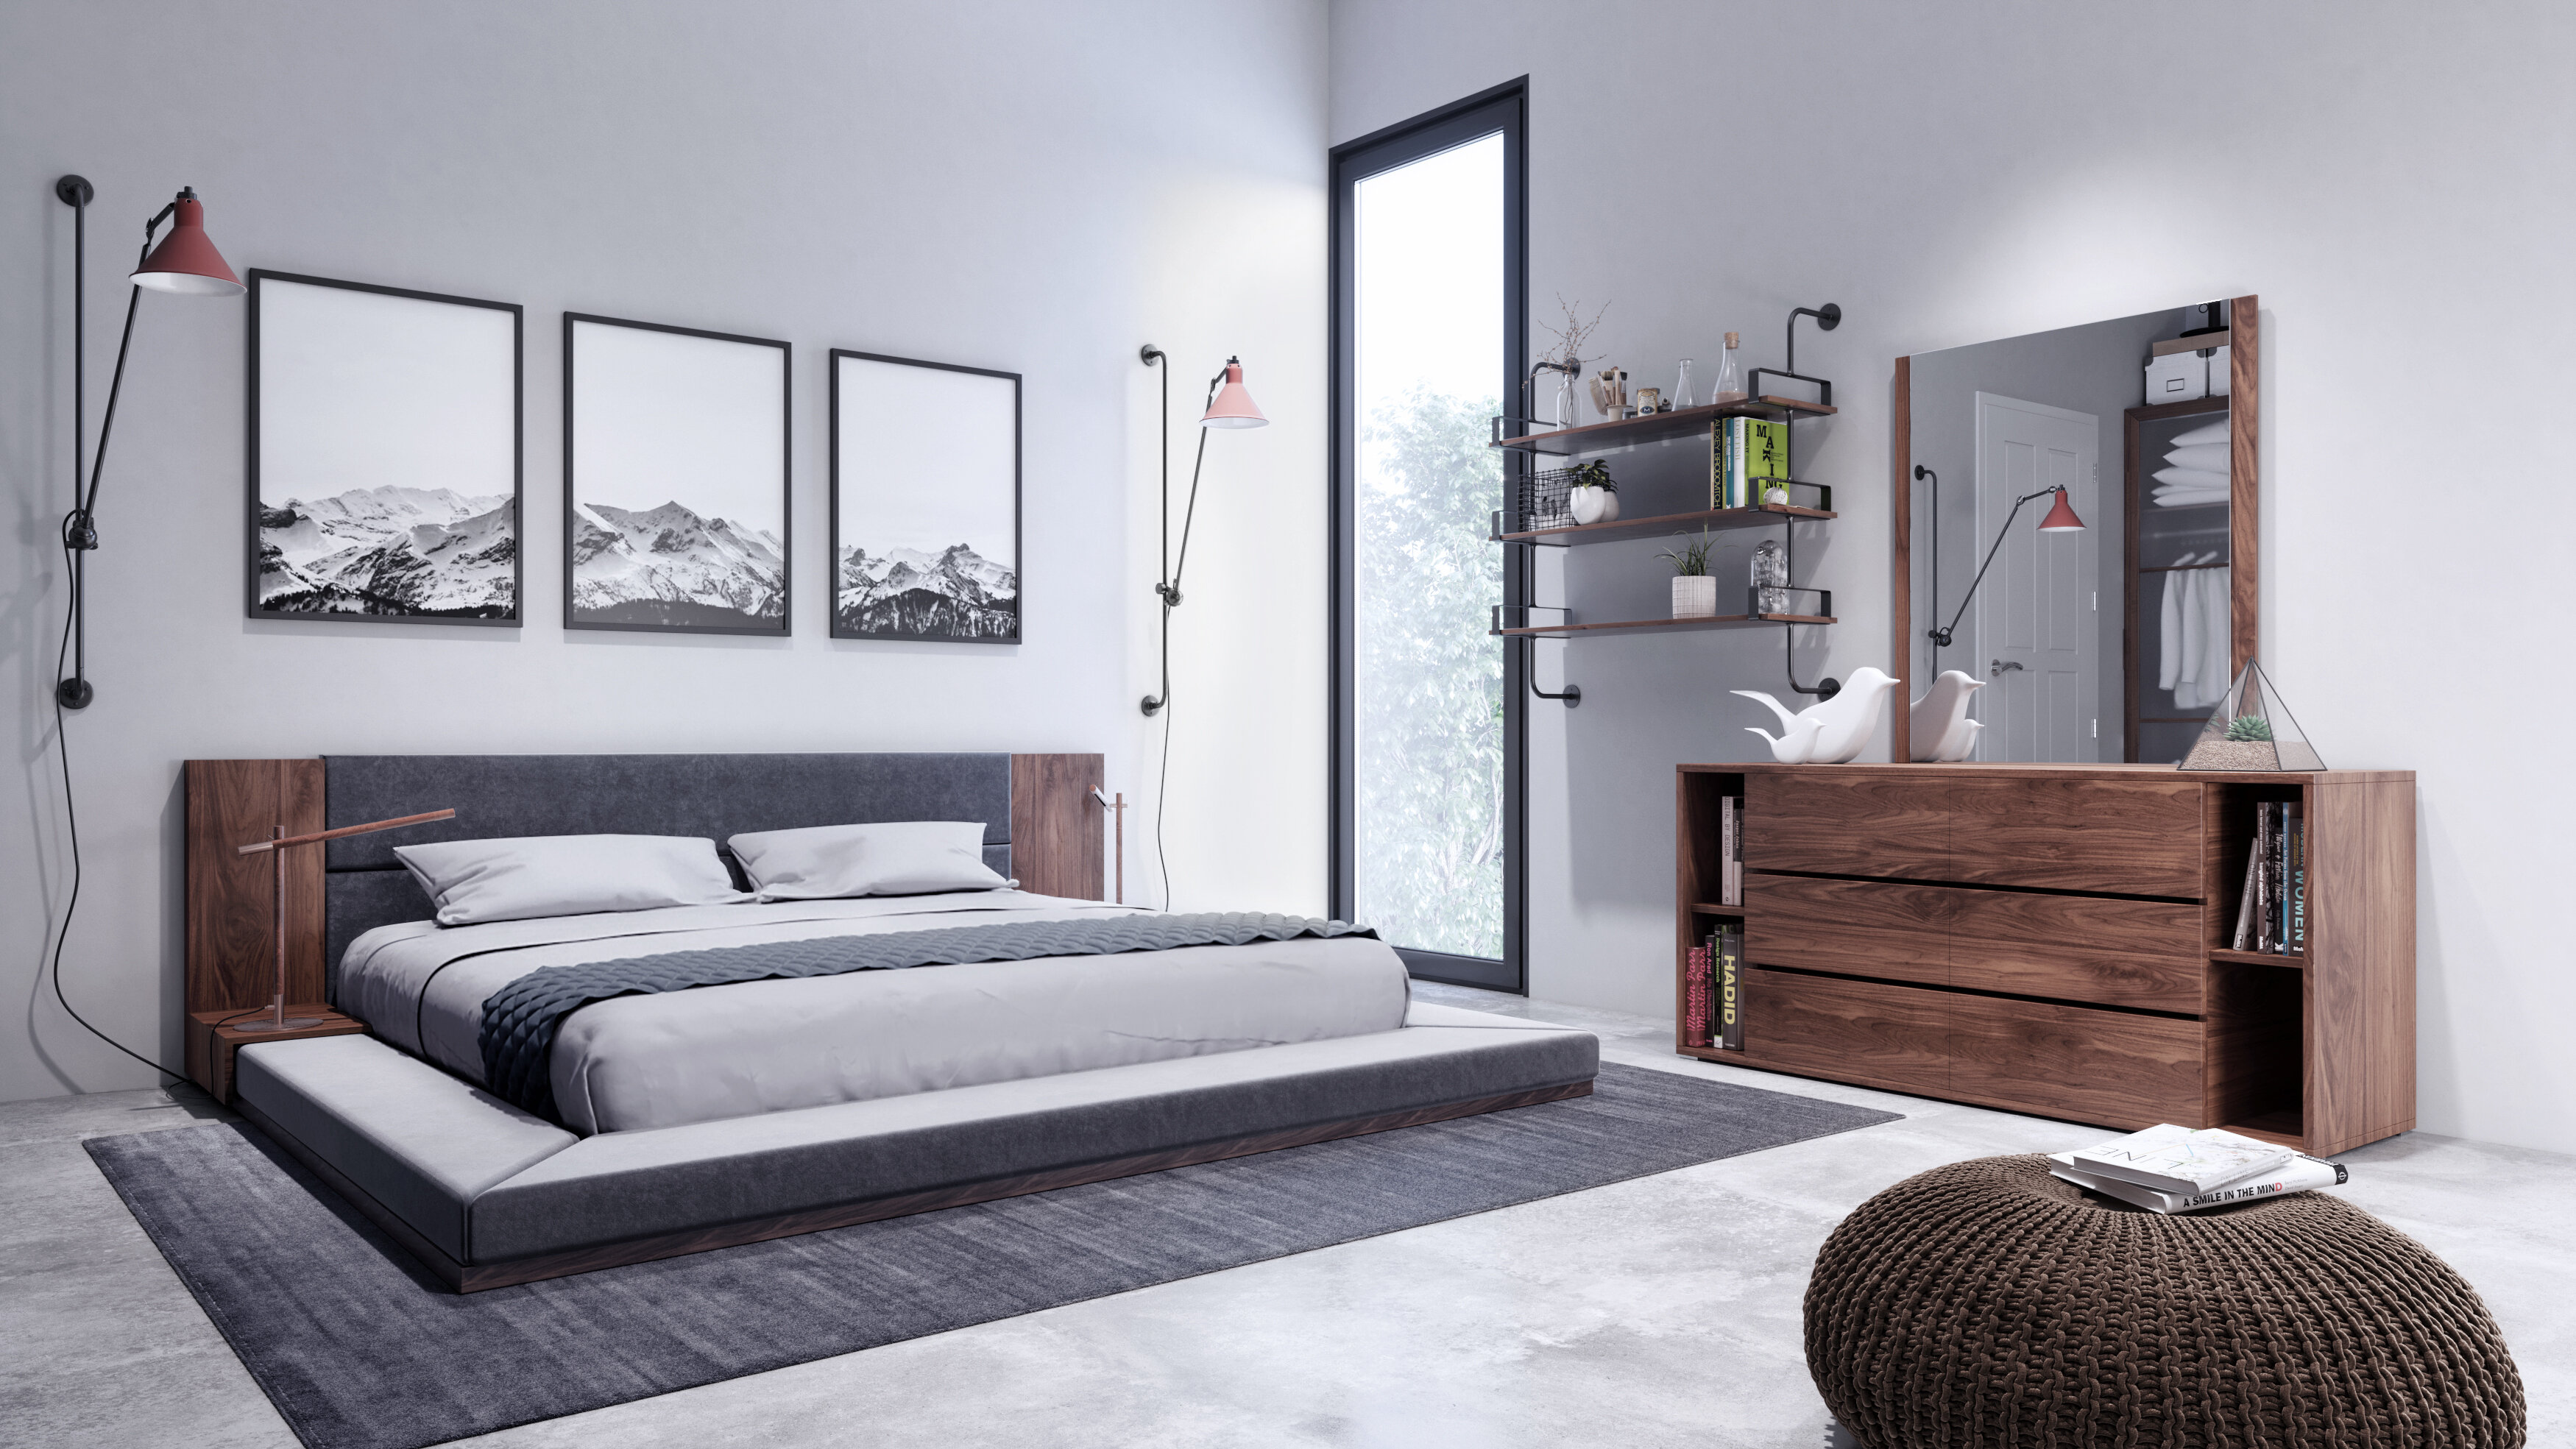 Marvelous Defalco Platform 3 Piece Bedroom Set Download Free Architecture Designs Intelgarnamadebymaigaardcom